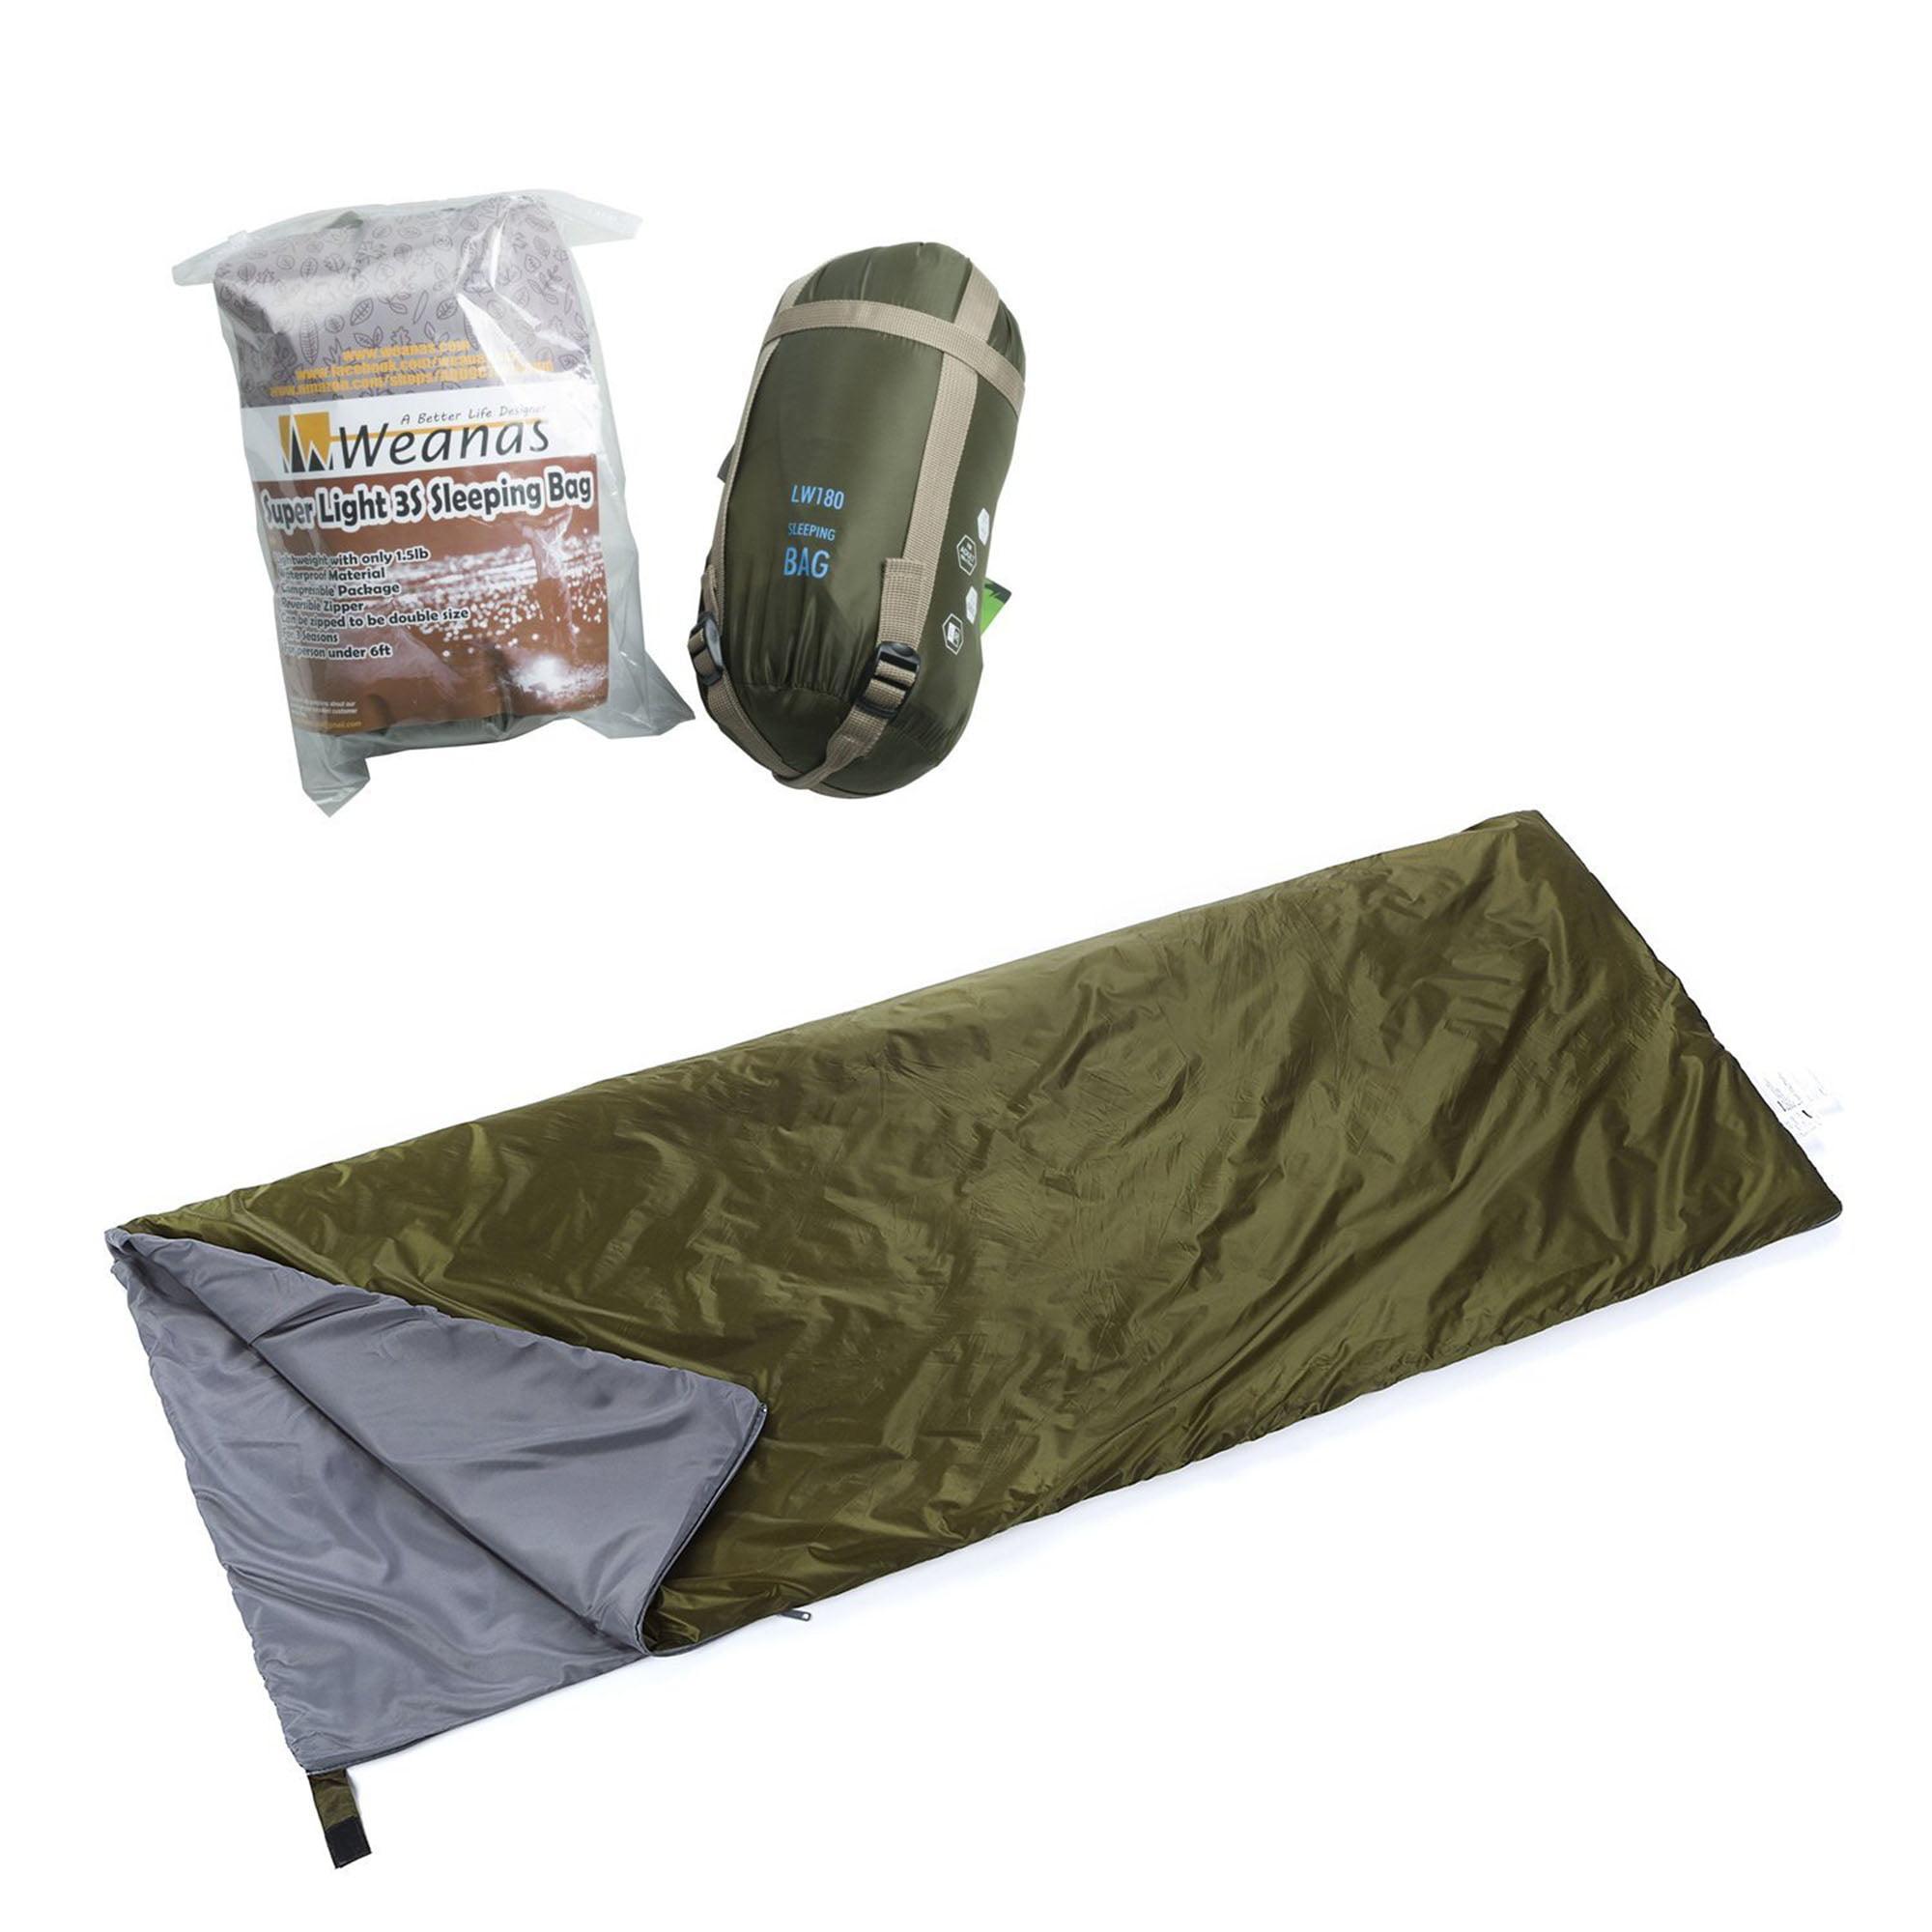 best sleeping bag for backpacking reddit